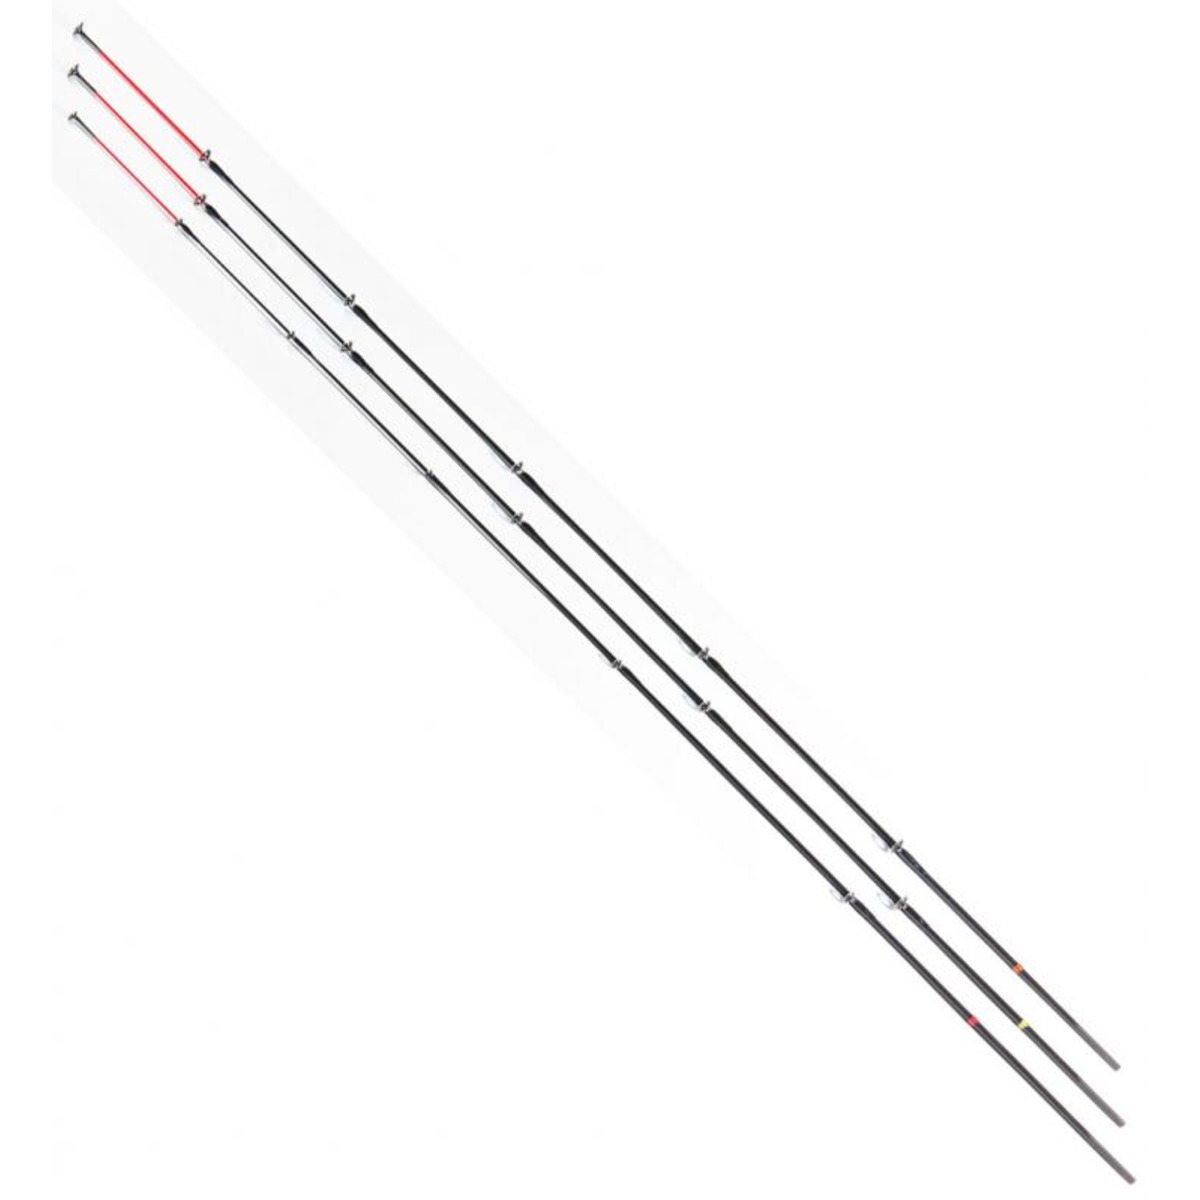 Trabucco Rutenspitze Selektor Xs Method Feeder - 60 cm - Aktion Light